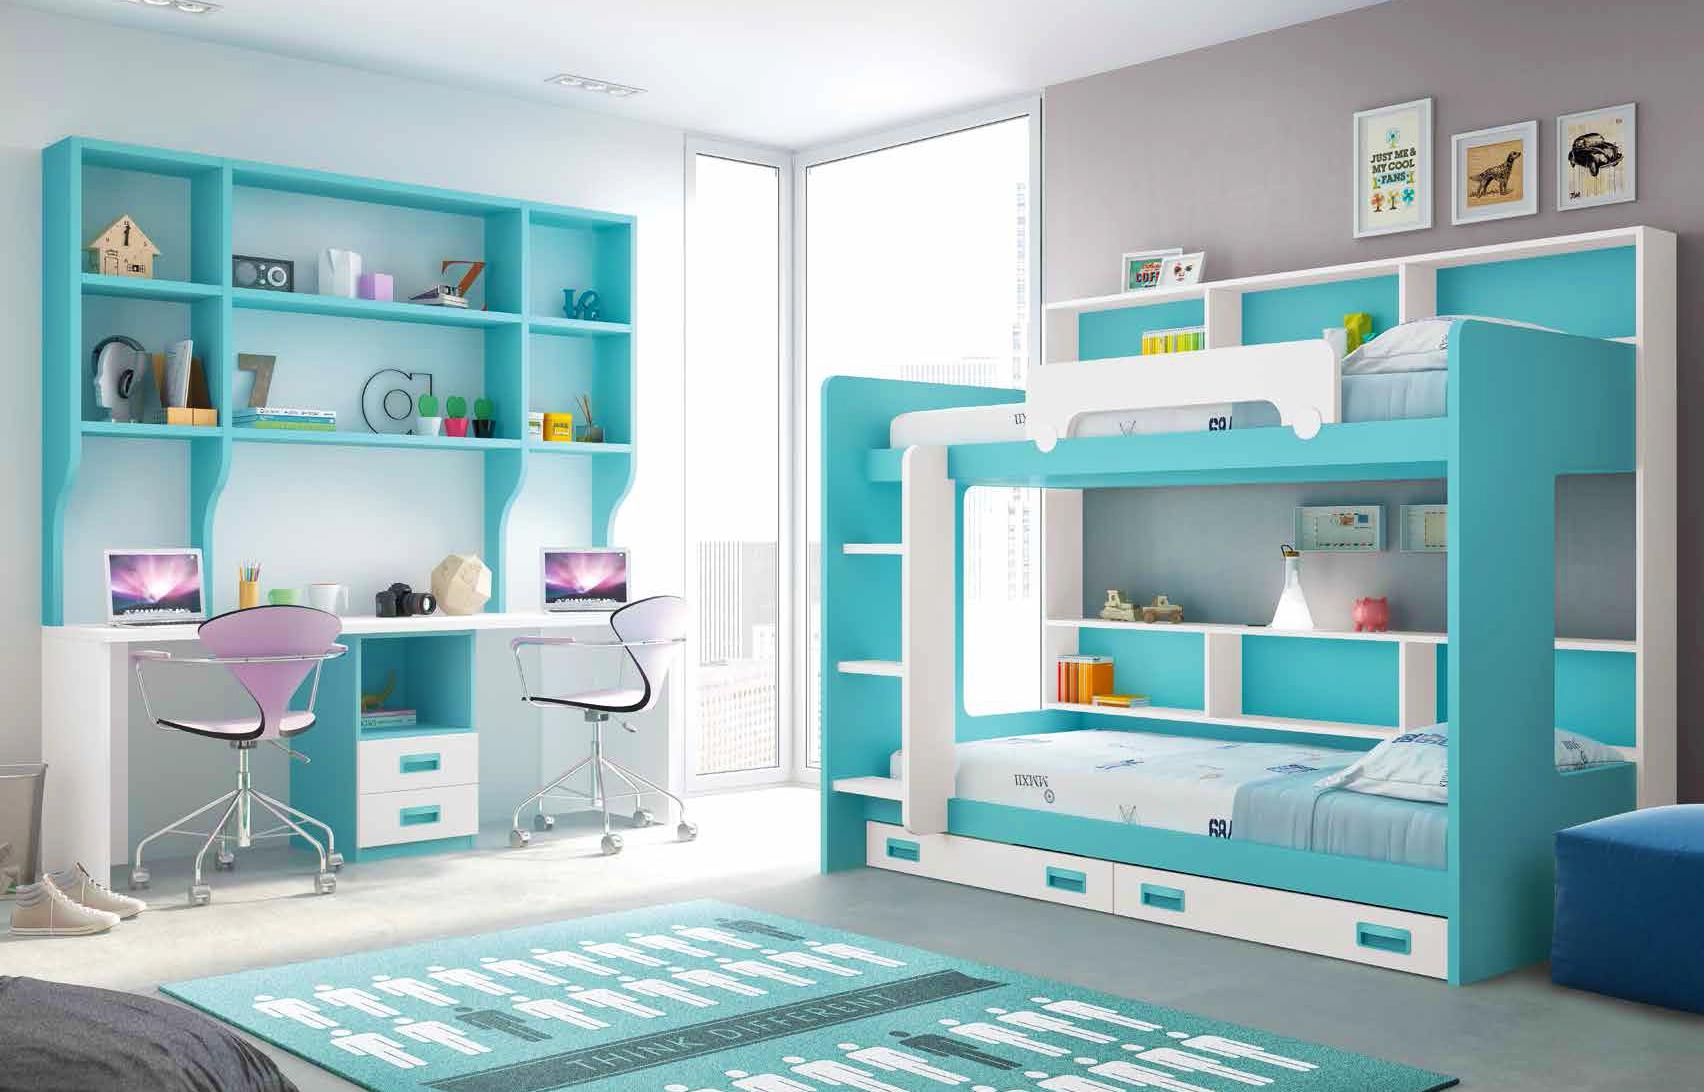 Comment R Ussir Am Nager Une Chambre Enfant Complete